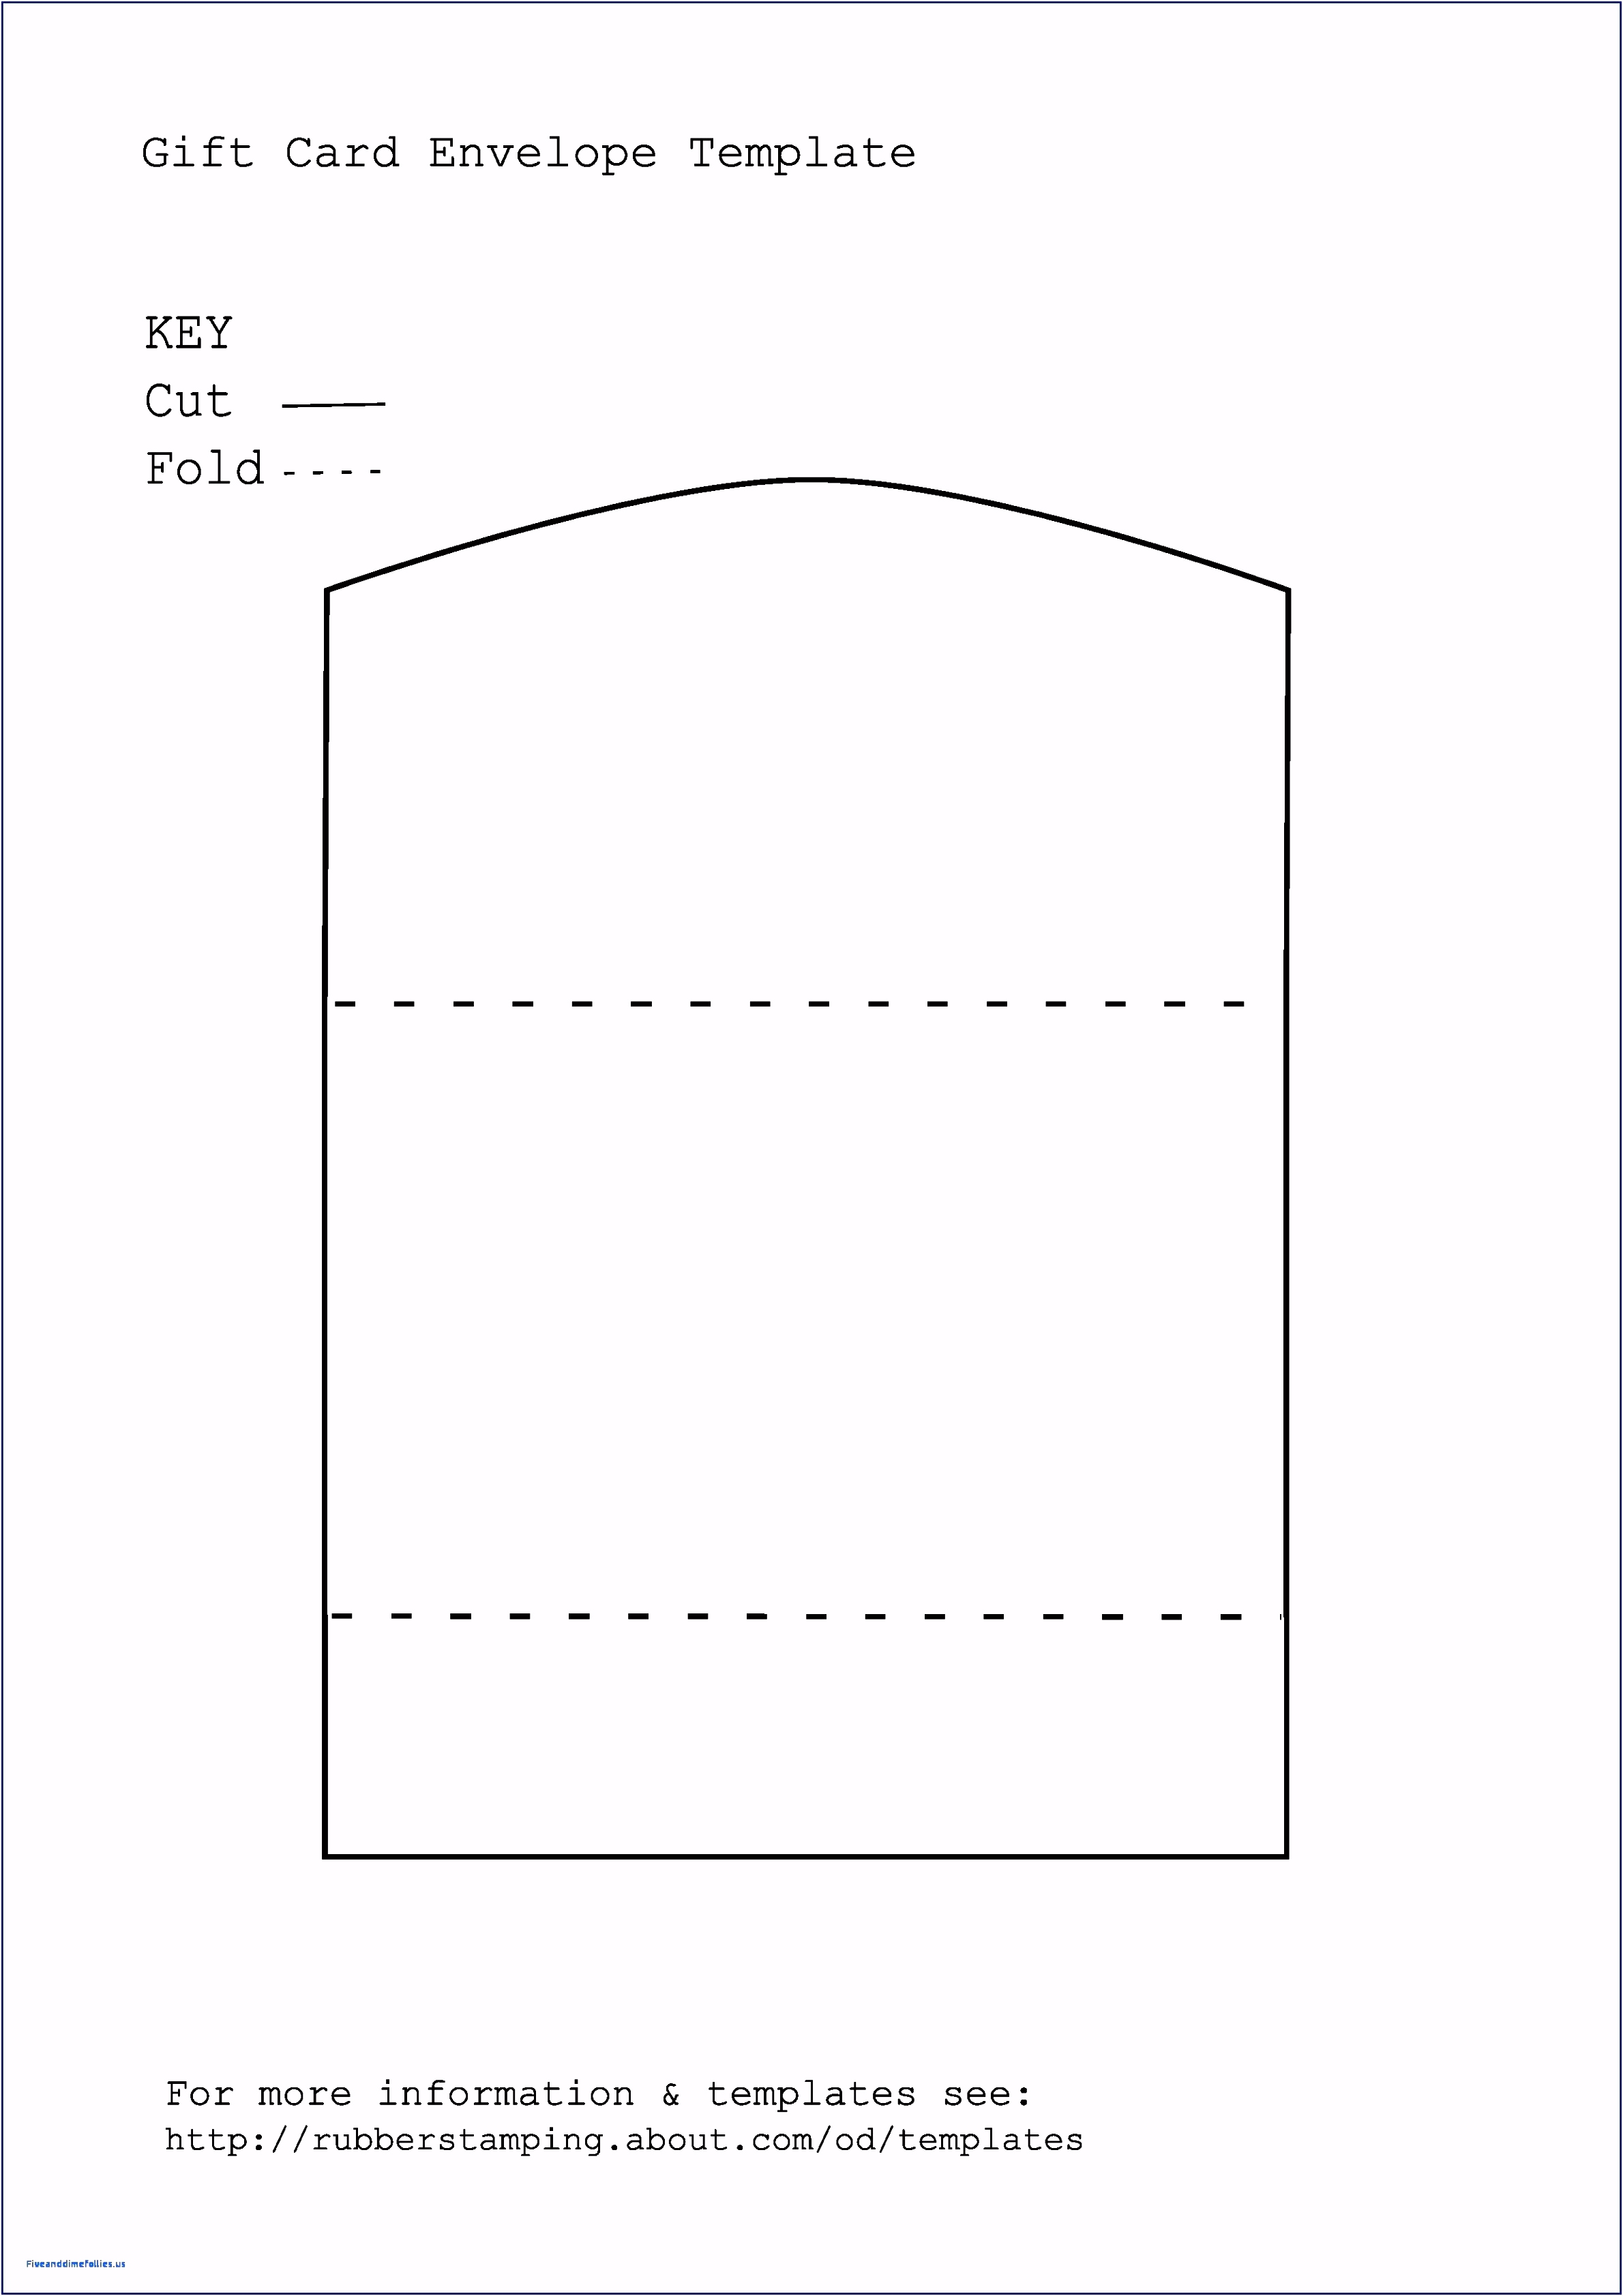 Make A Brochure In Word – Falzflyer Vorlage Word 18 How to Make A